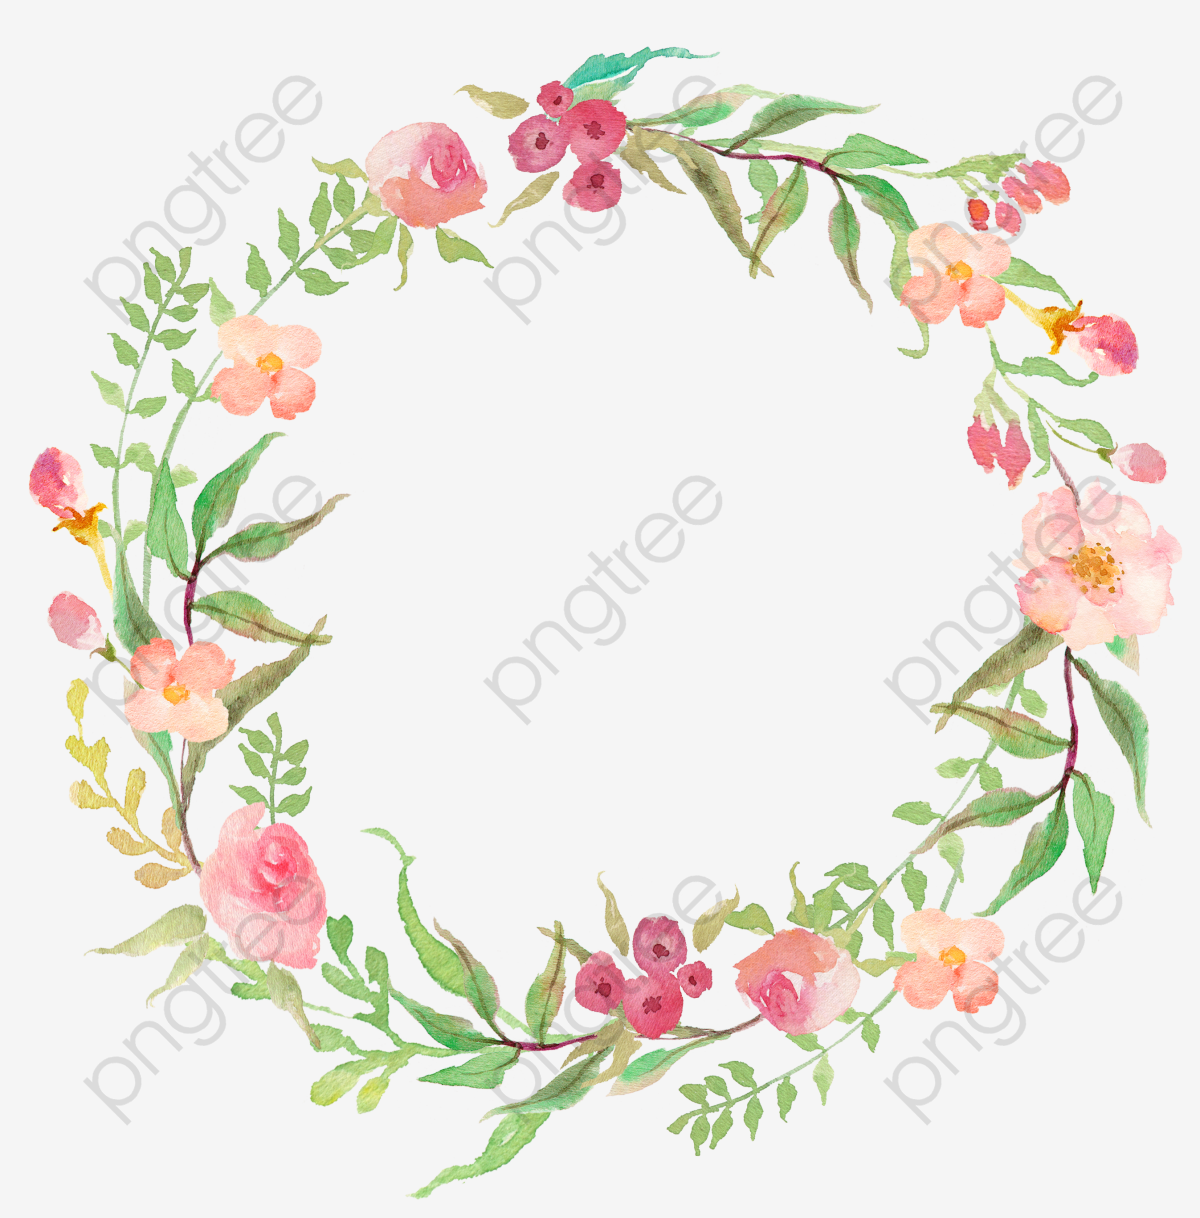 Drawing Circular Wreath 18, Flower, Watercolor, Ring PNG Transparent.